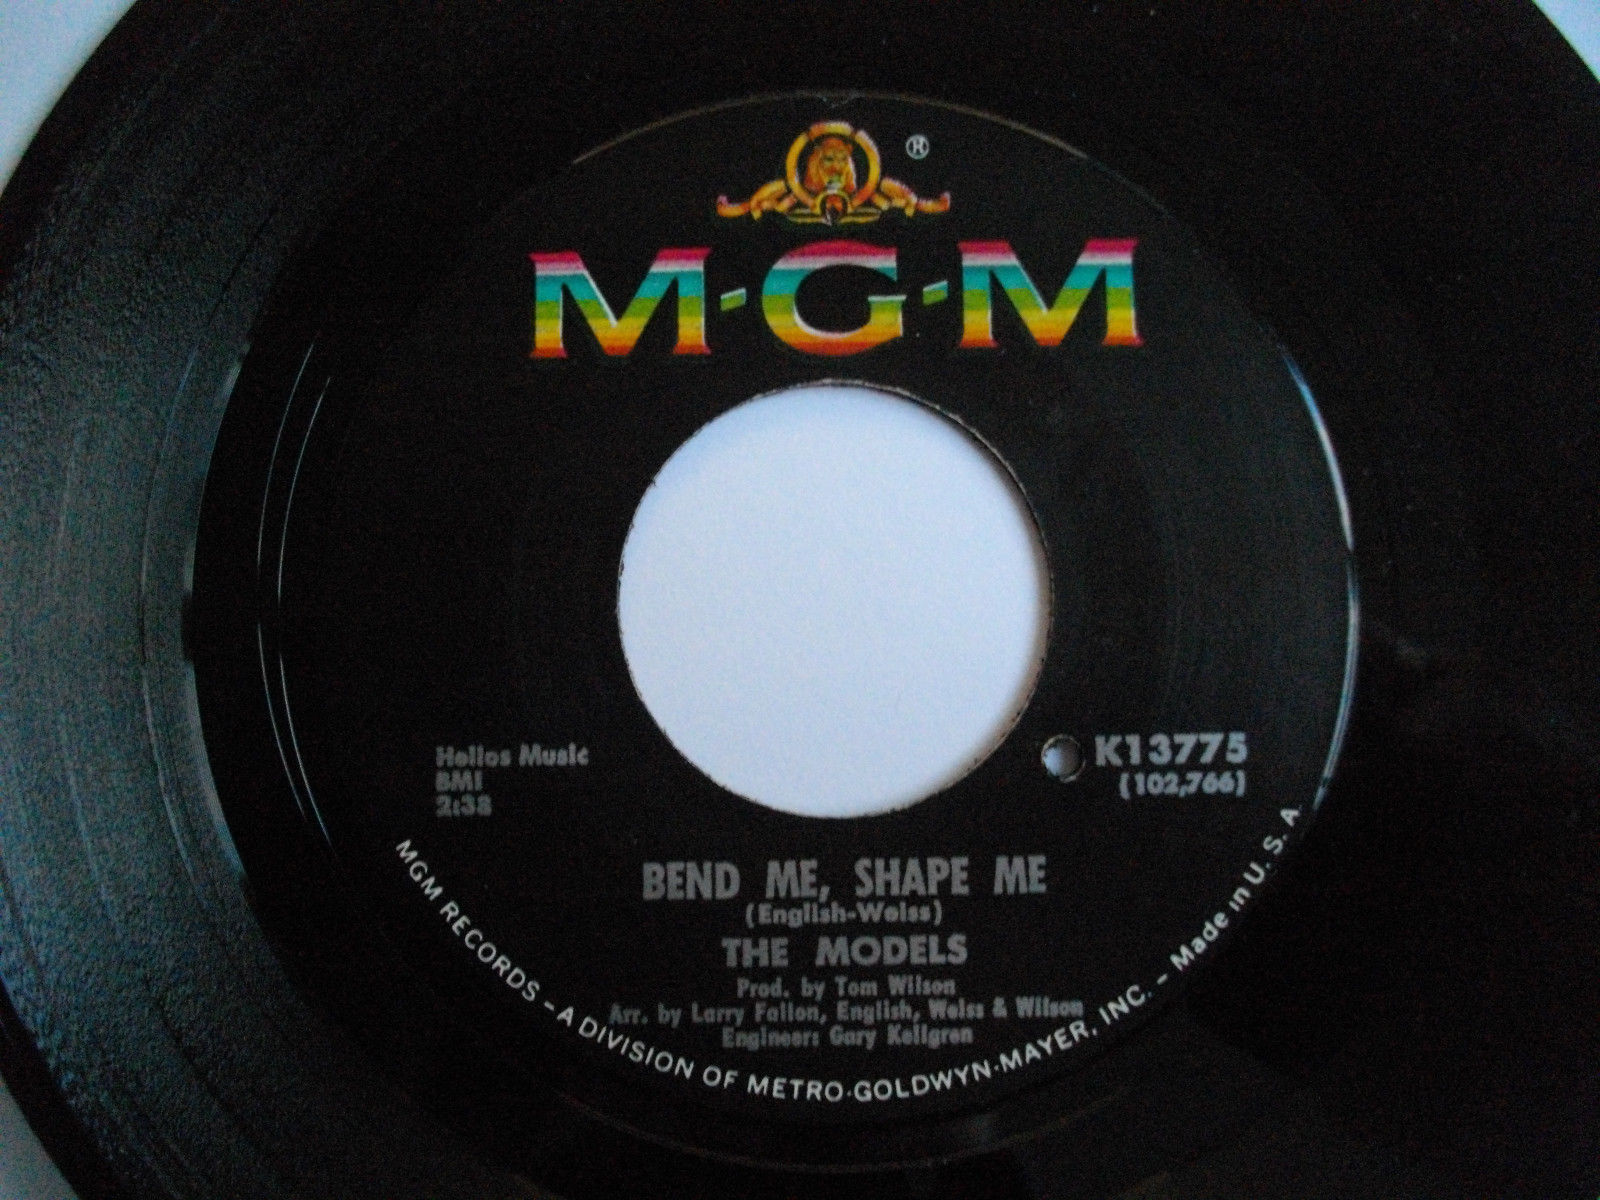 The Models - Bend me, Shape me. MGM K-13775. Mint, unplayed.